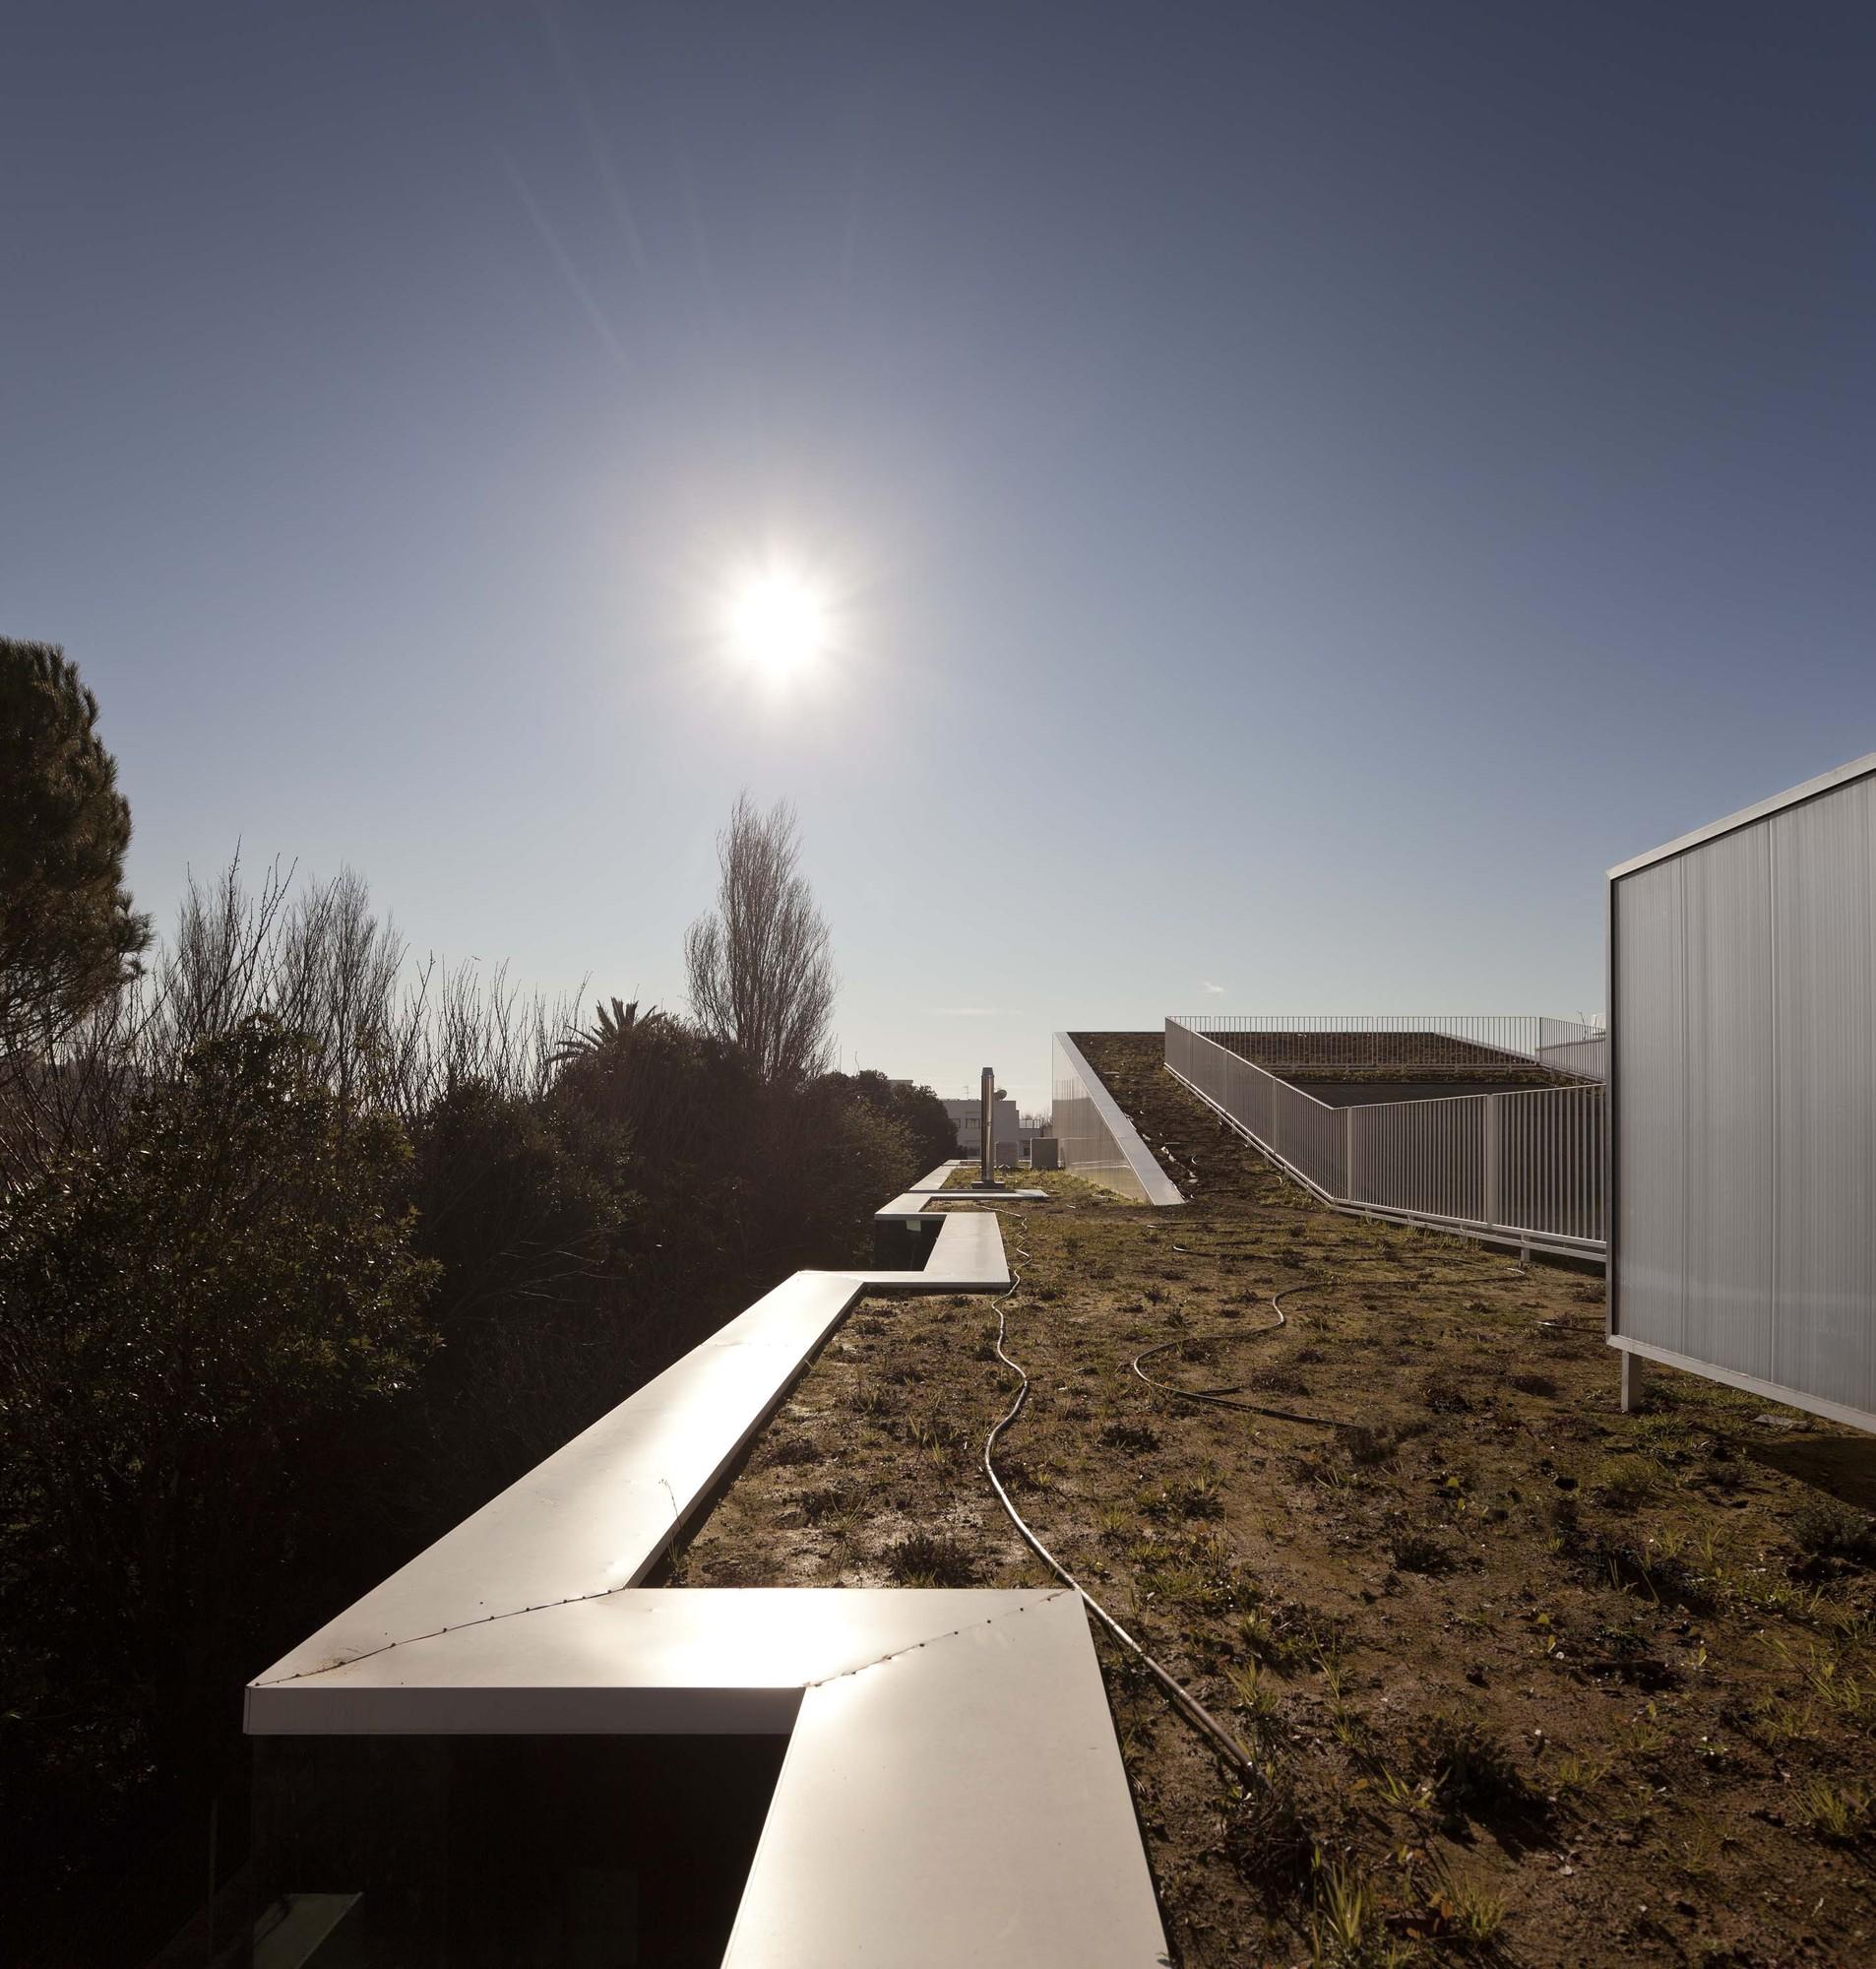 Center School S.Miguel de Nevogilde / AVA Architects